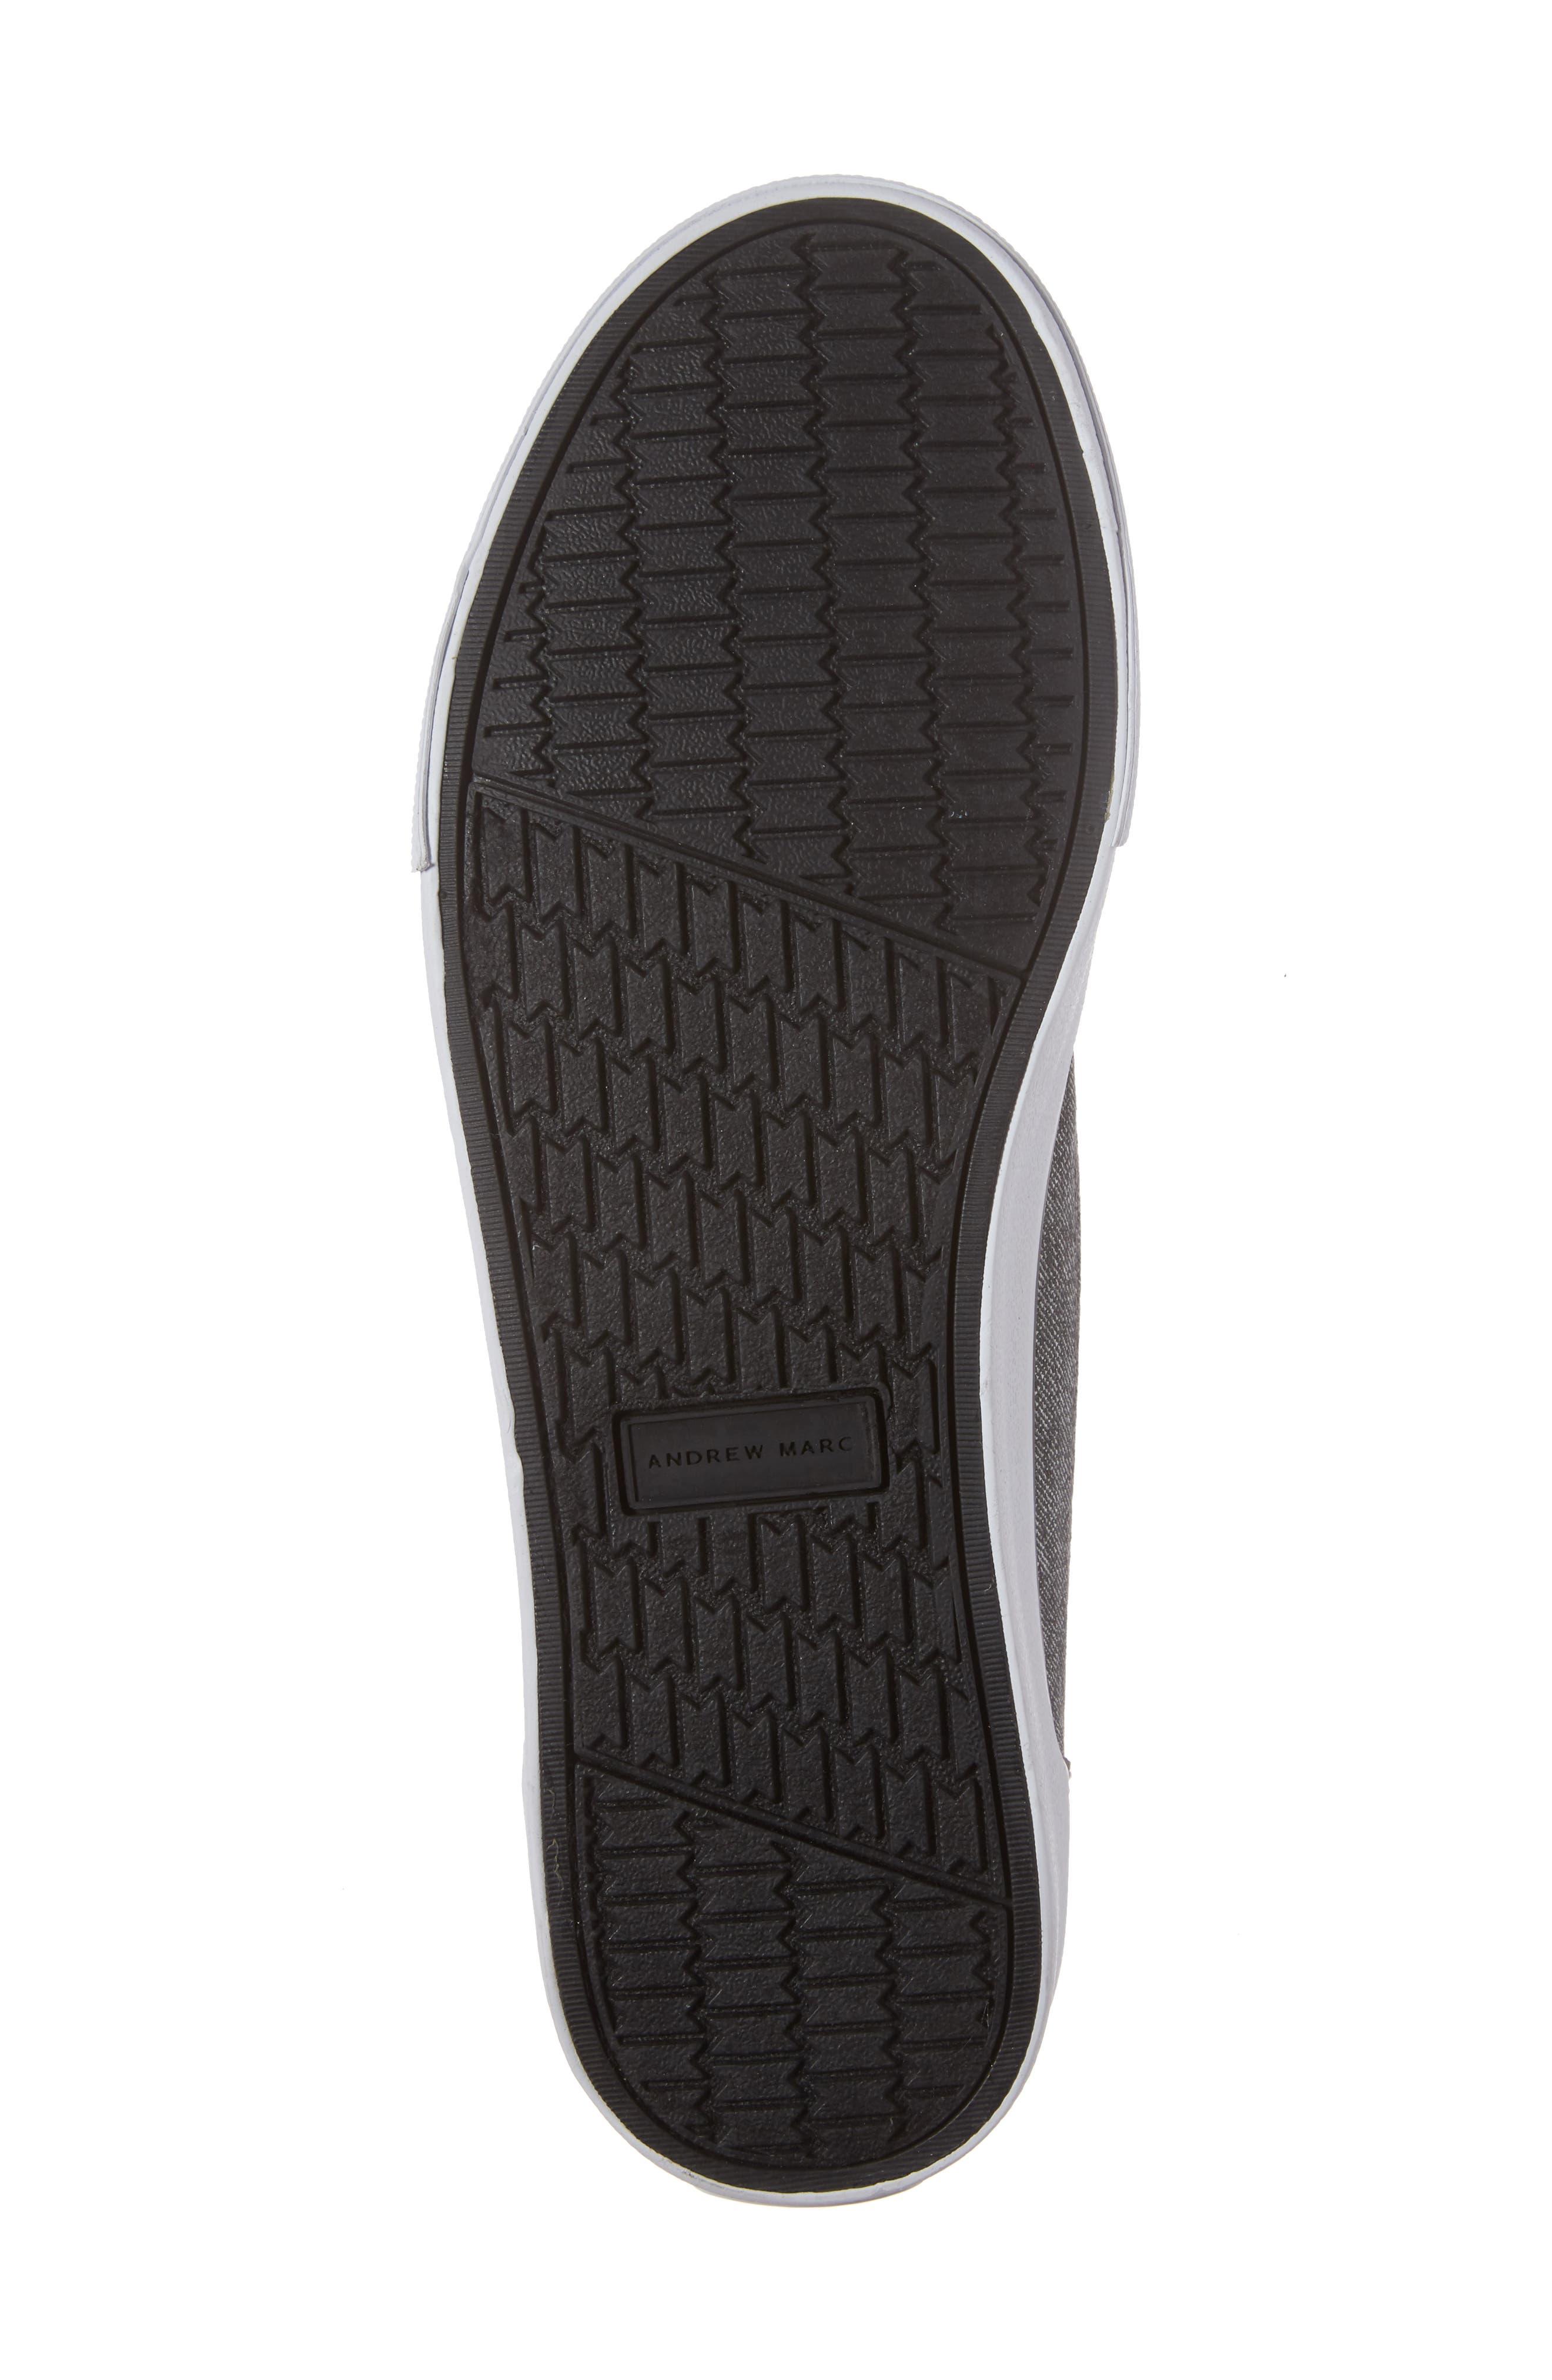 Reade Chukka Sneaker,                             Alternate thumbnail 6, color,                             Charcoal/Dk Charcoal/White